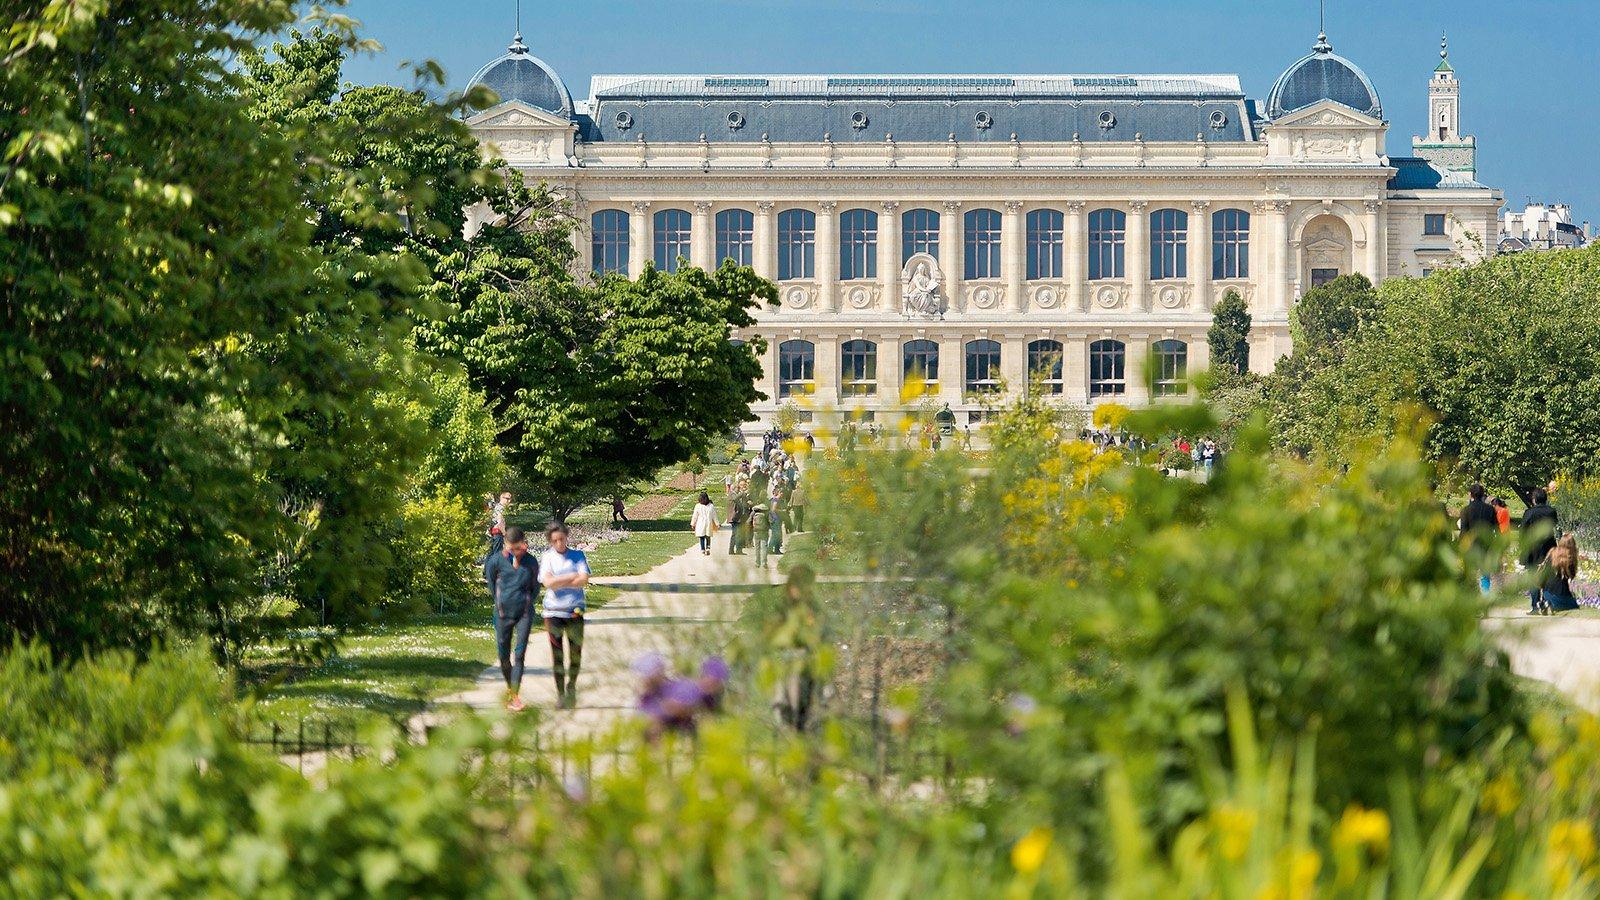 Jardin des Plantes dorchester collection summer 2019 ideas what to do